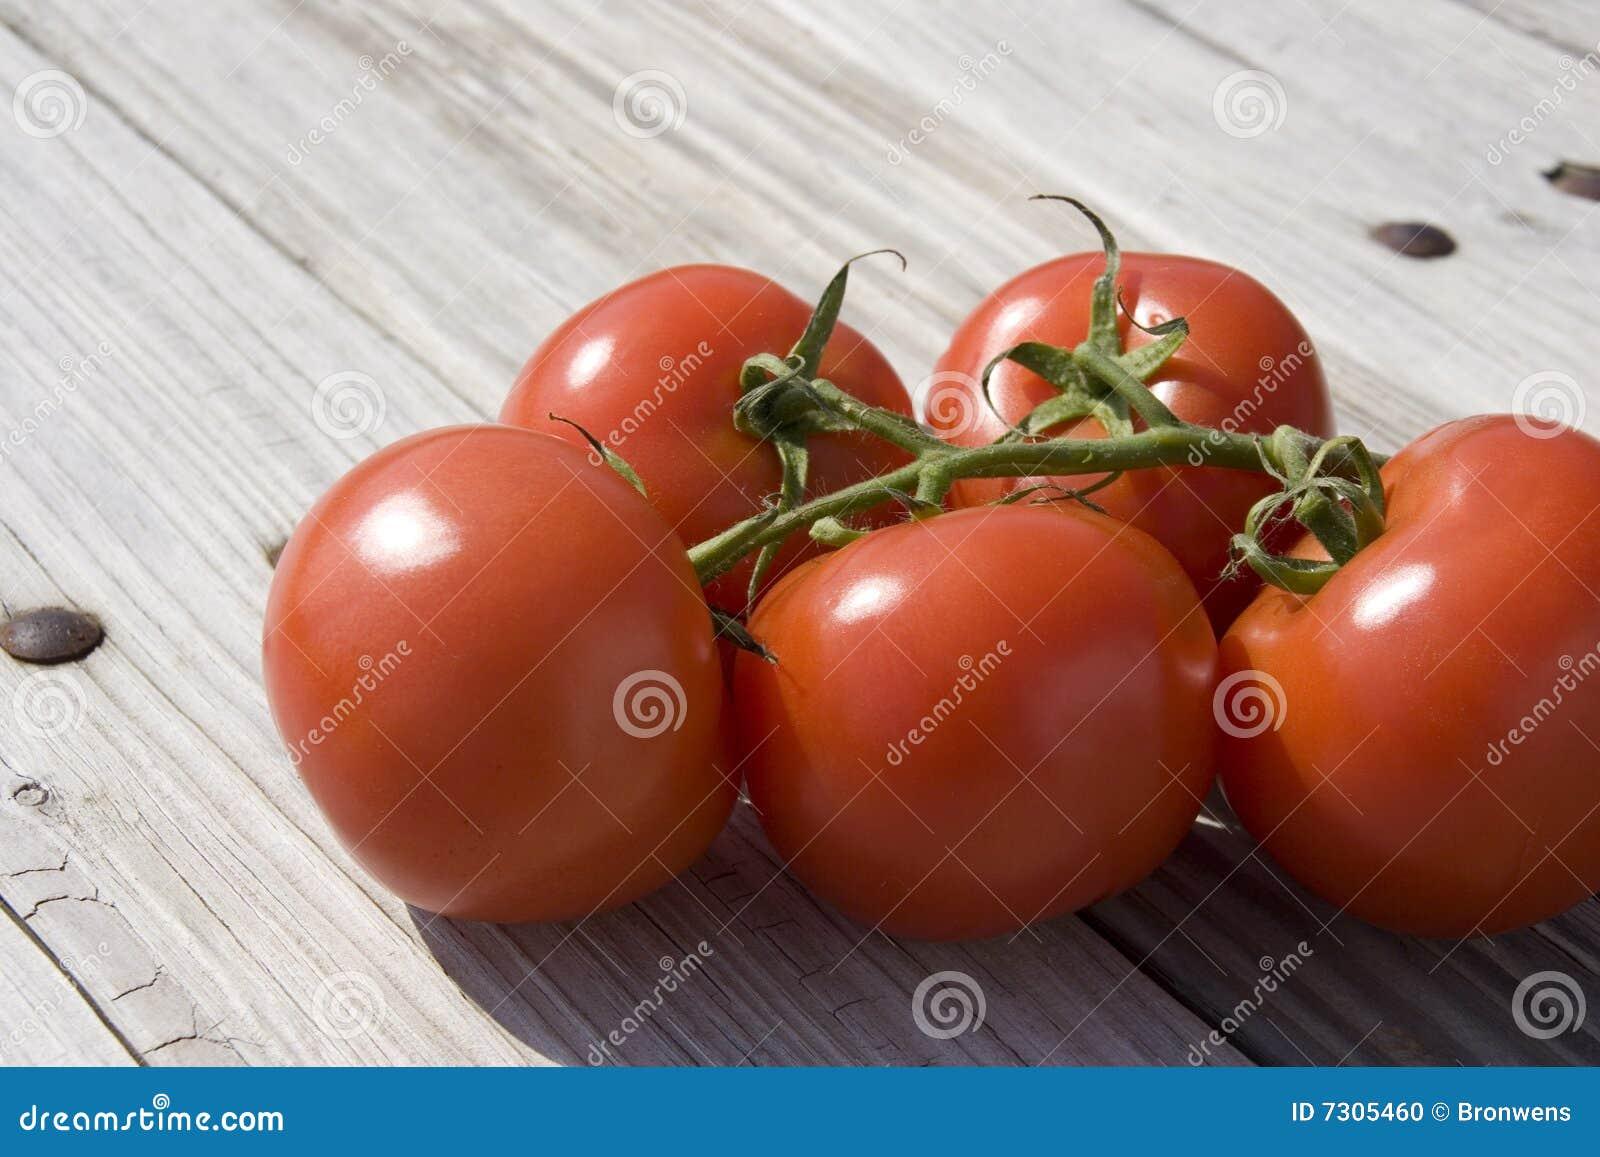 Pomodori del giardino